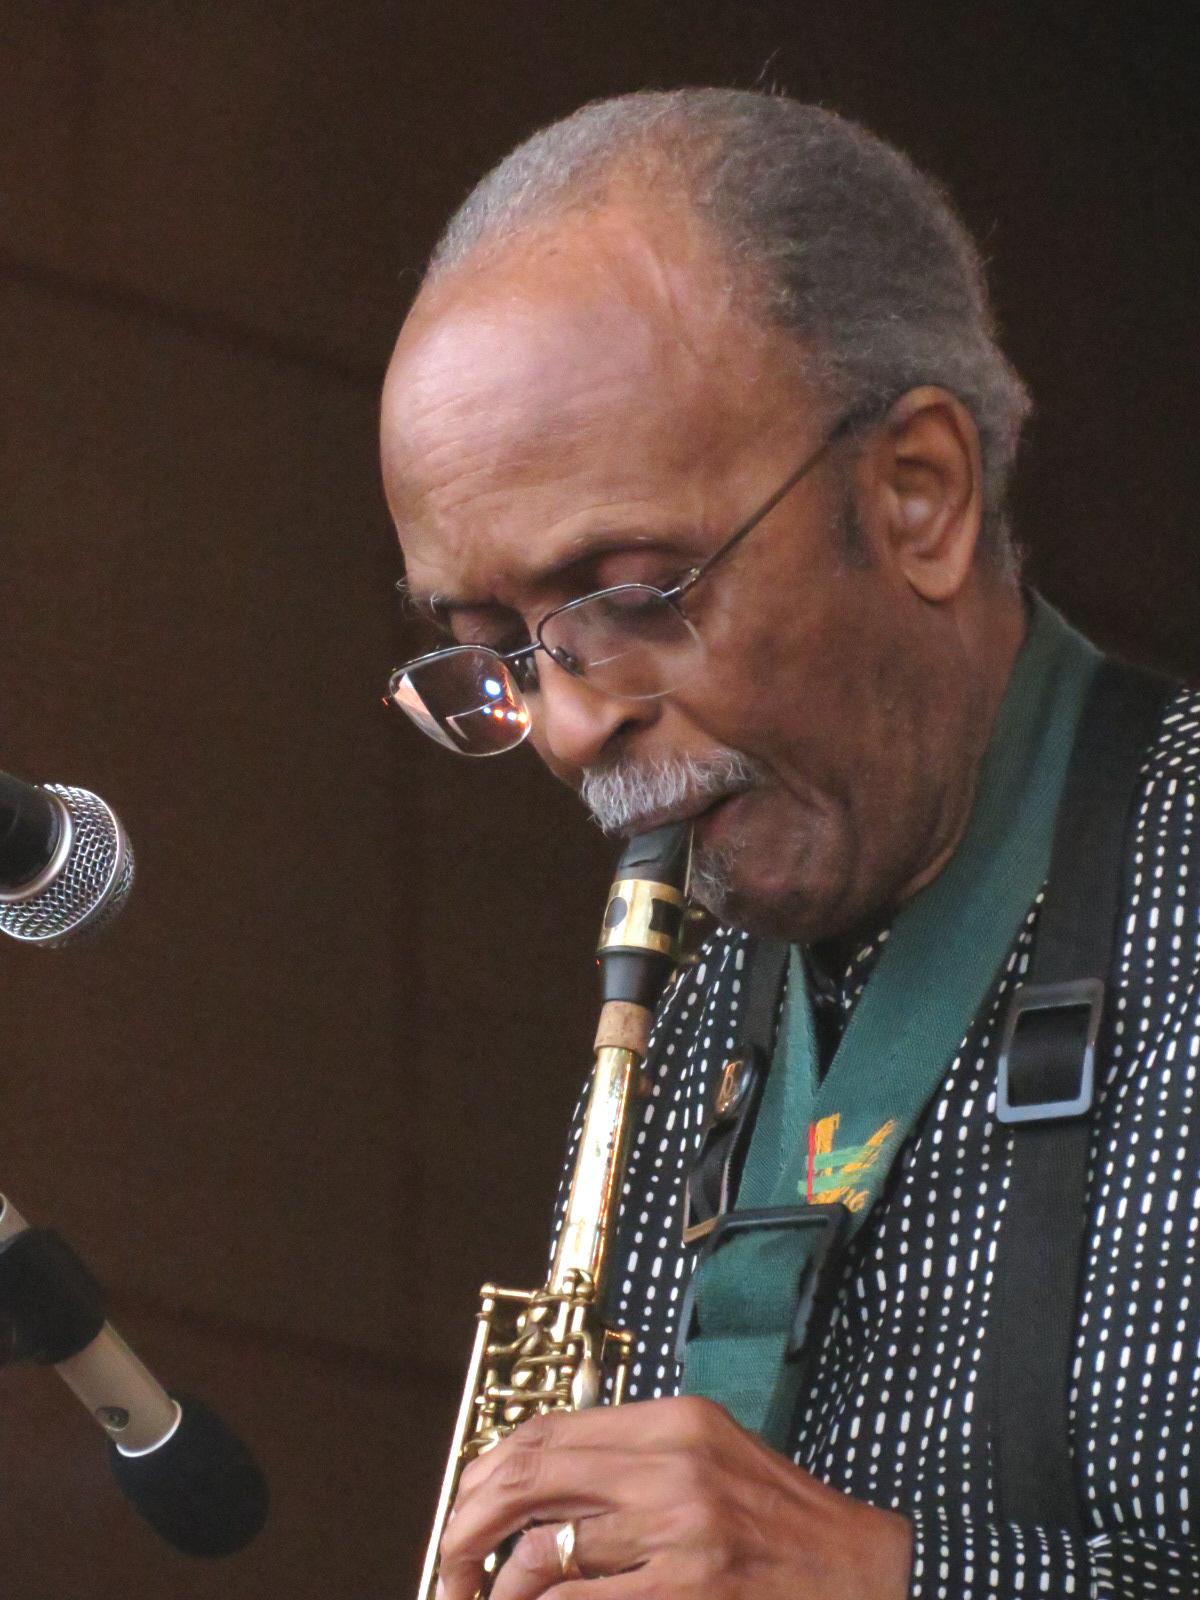 Jimmy heath leading his quartet at 2013 chicago jazz festival